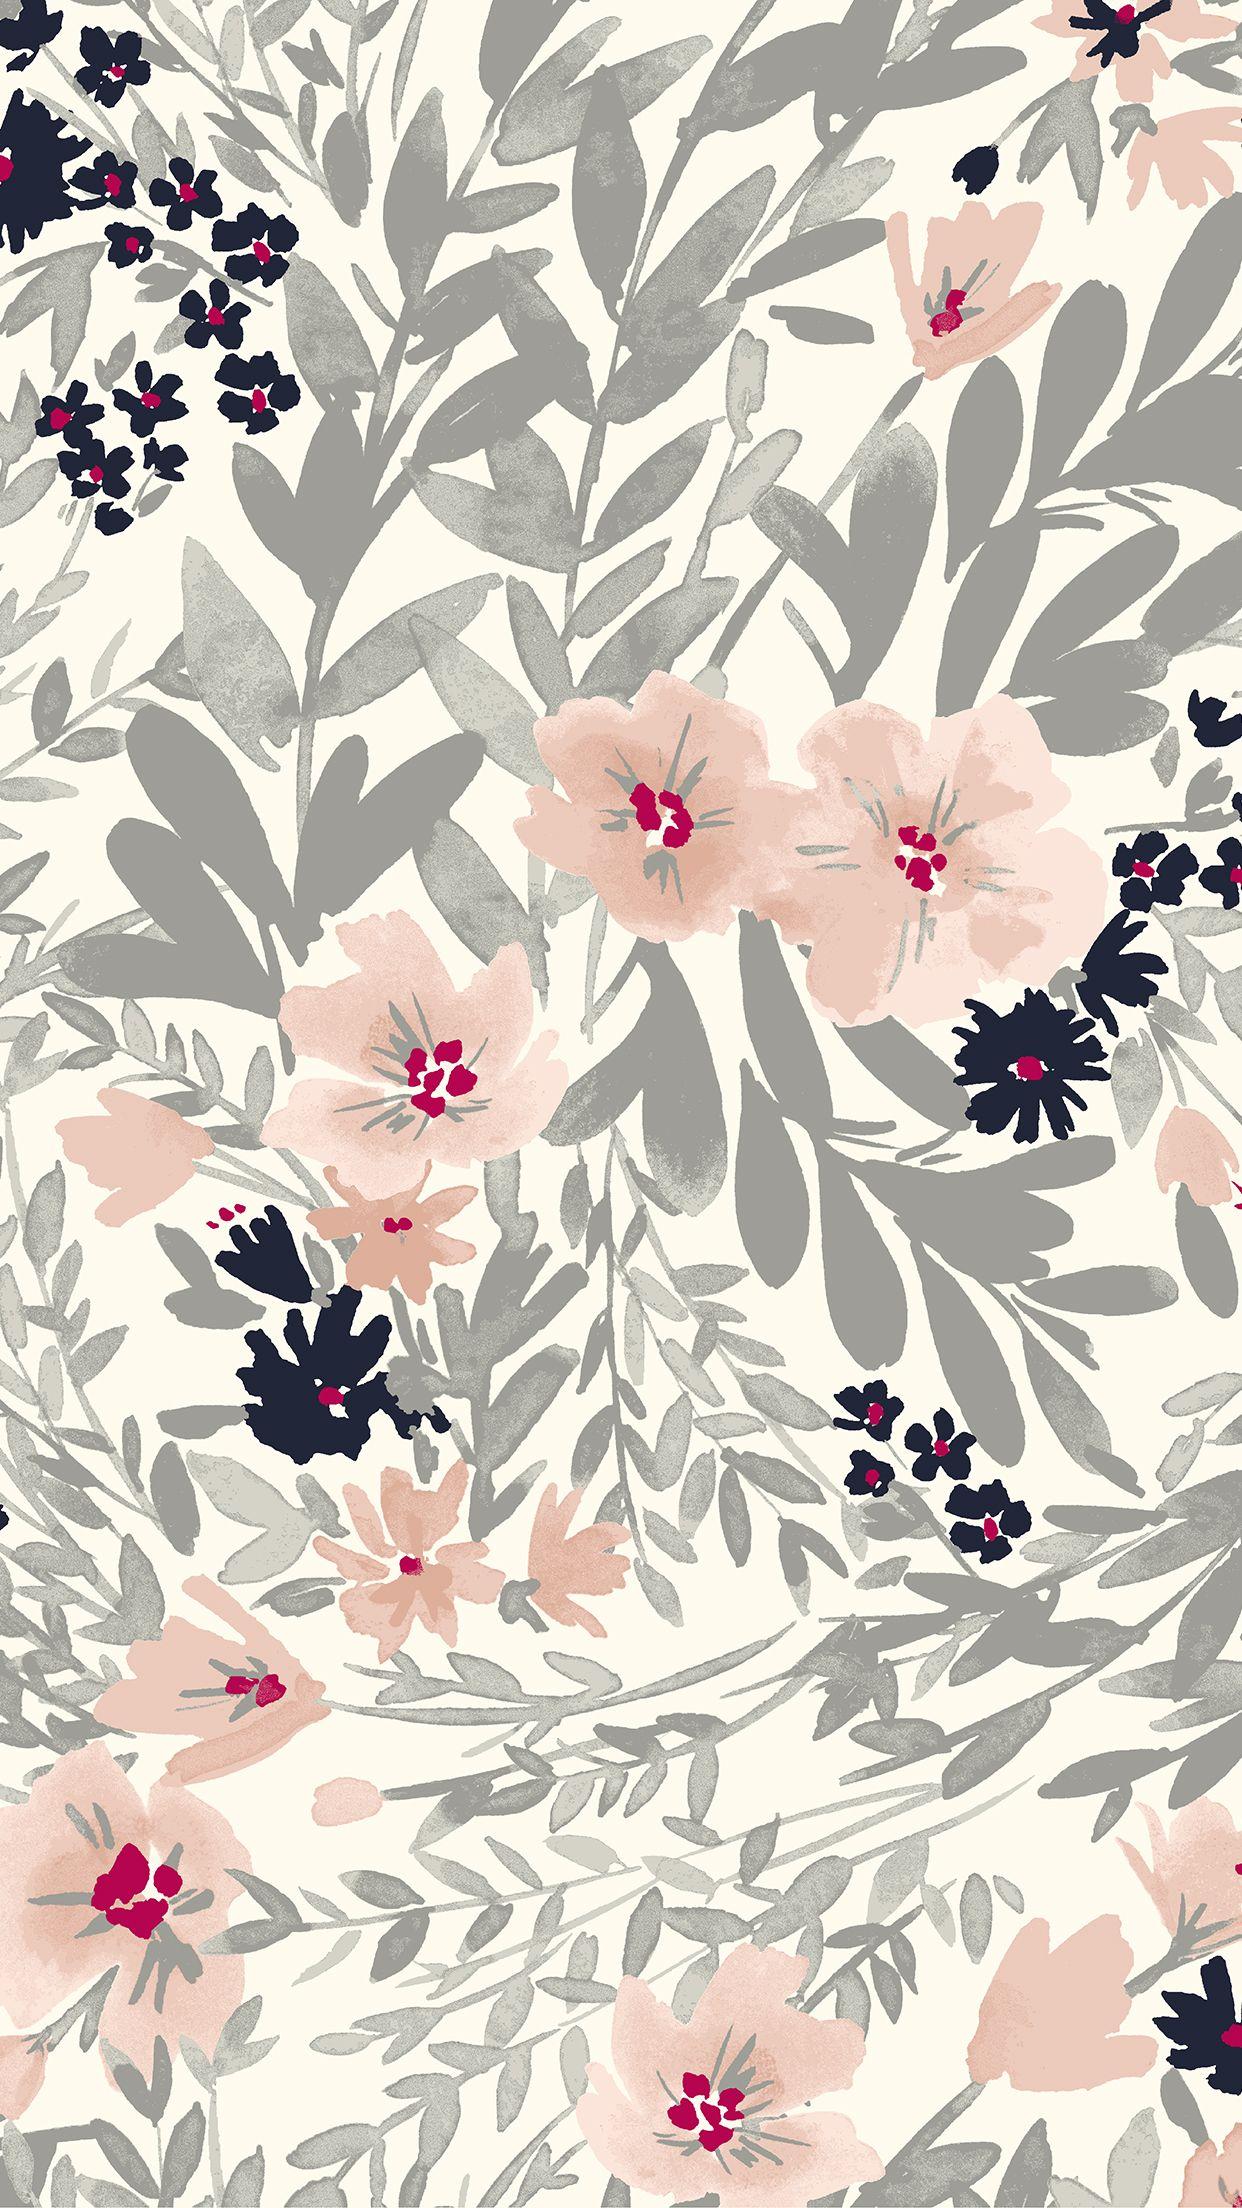 Mobile Wallpaper, Floral Wallpaper Desktop, Cell Phone Wallpapers, Iphone 7 Wallpaper Backgrounds,